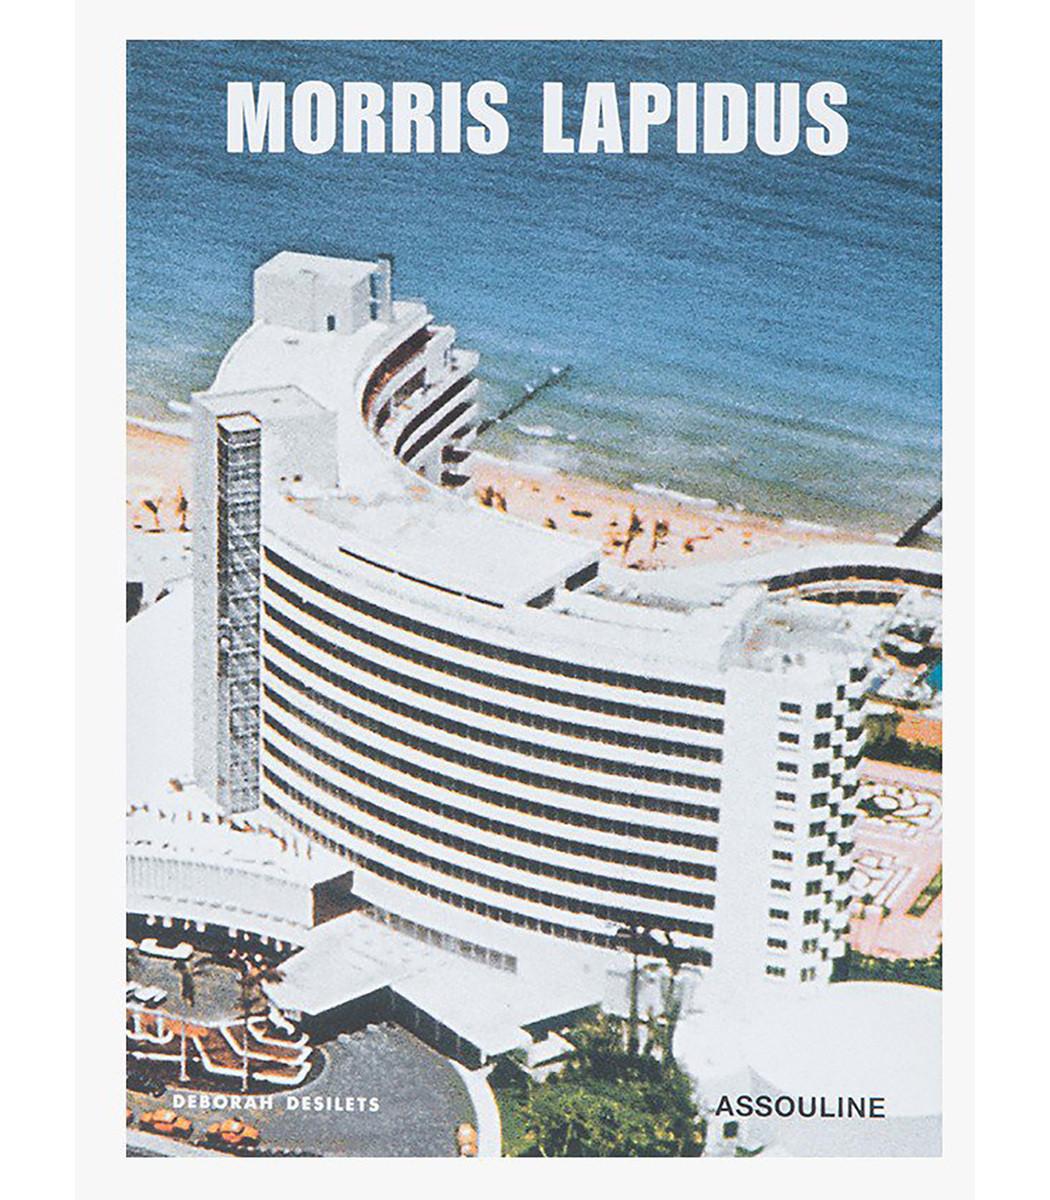 ASSOULINE Morris Lapidus Book in N/A